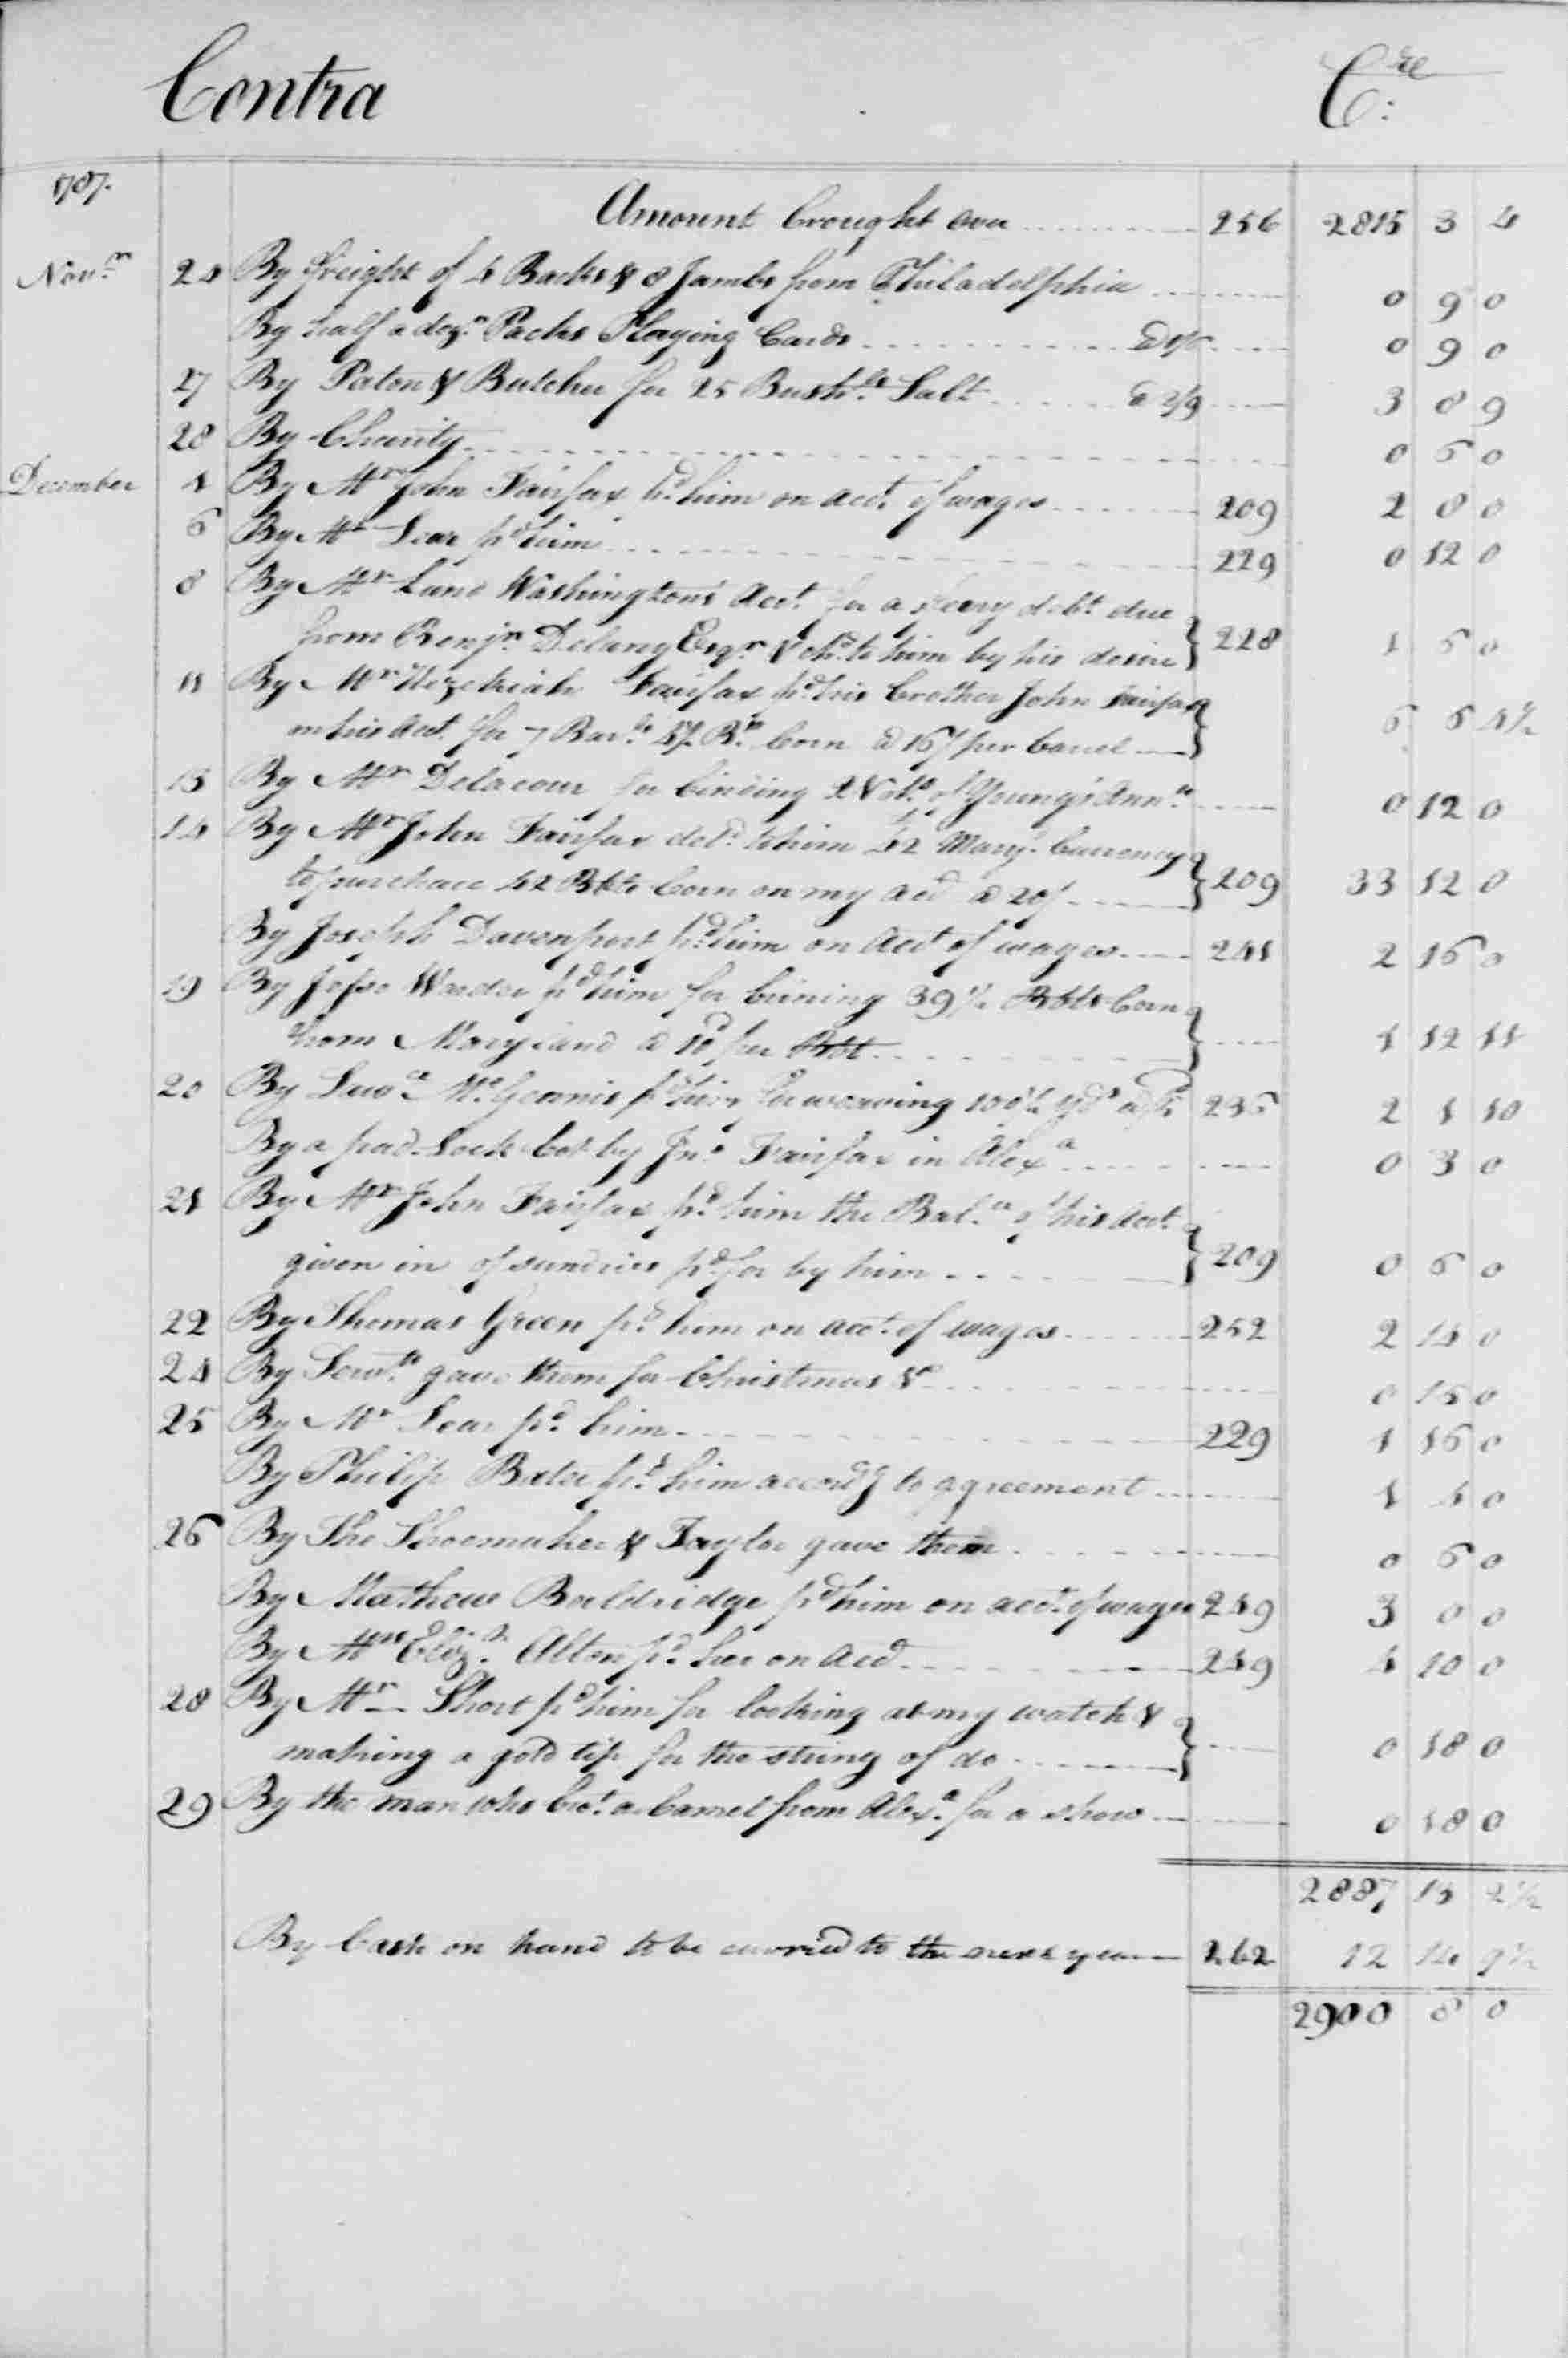 Ledger B, folio 257, right side